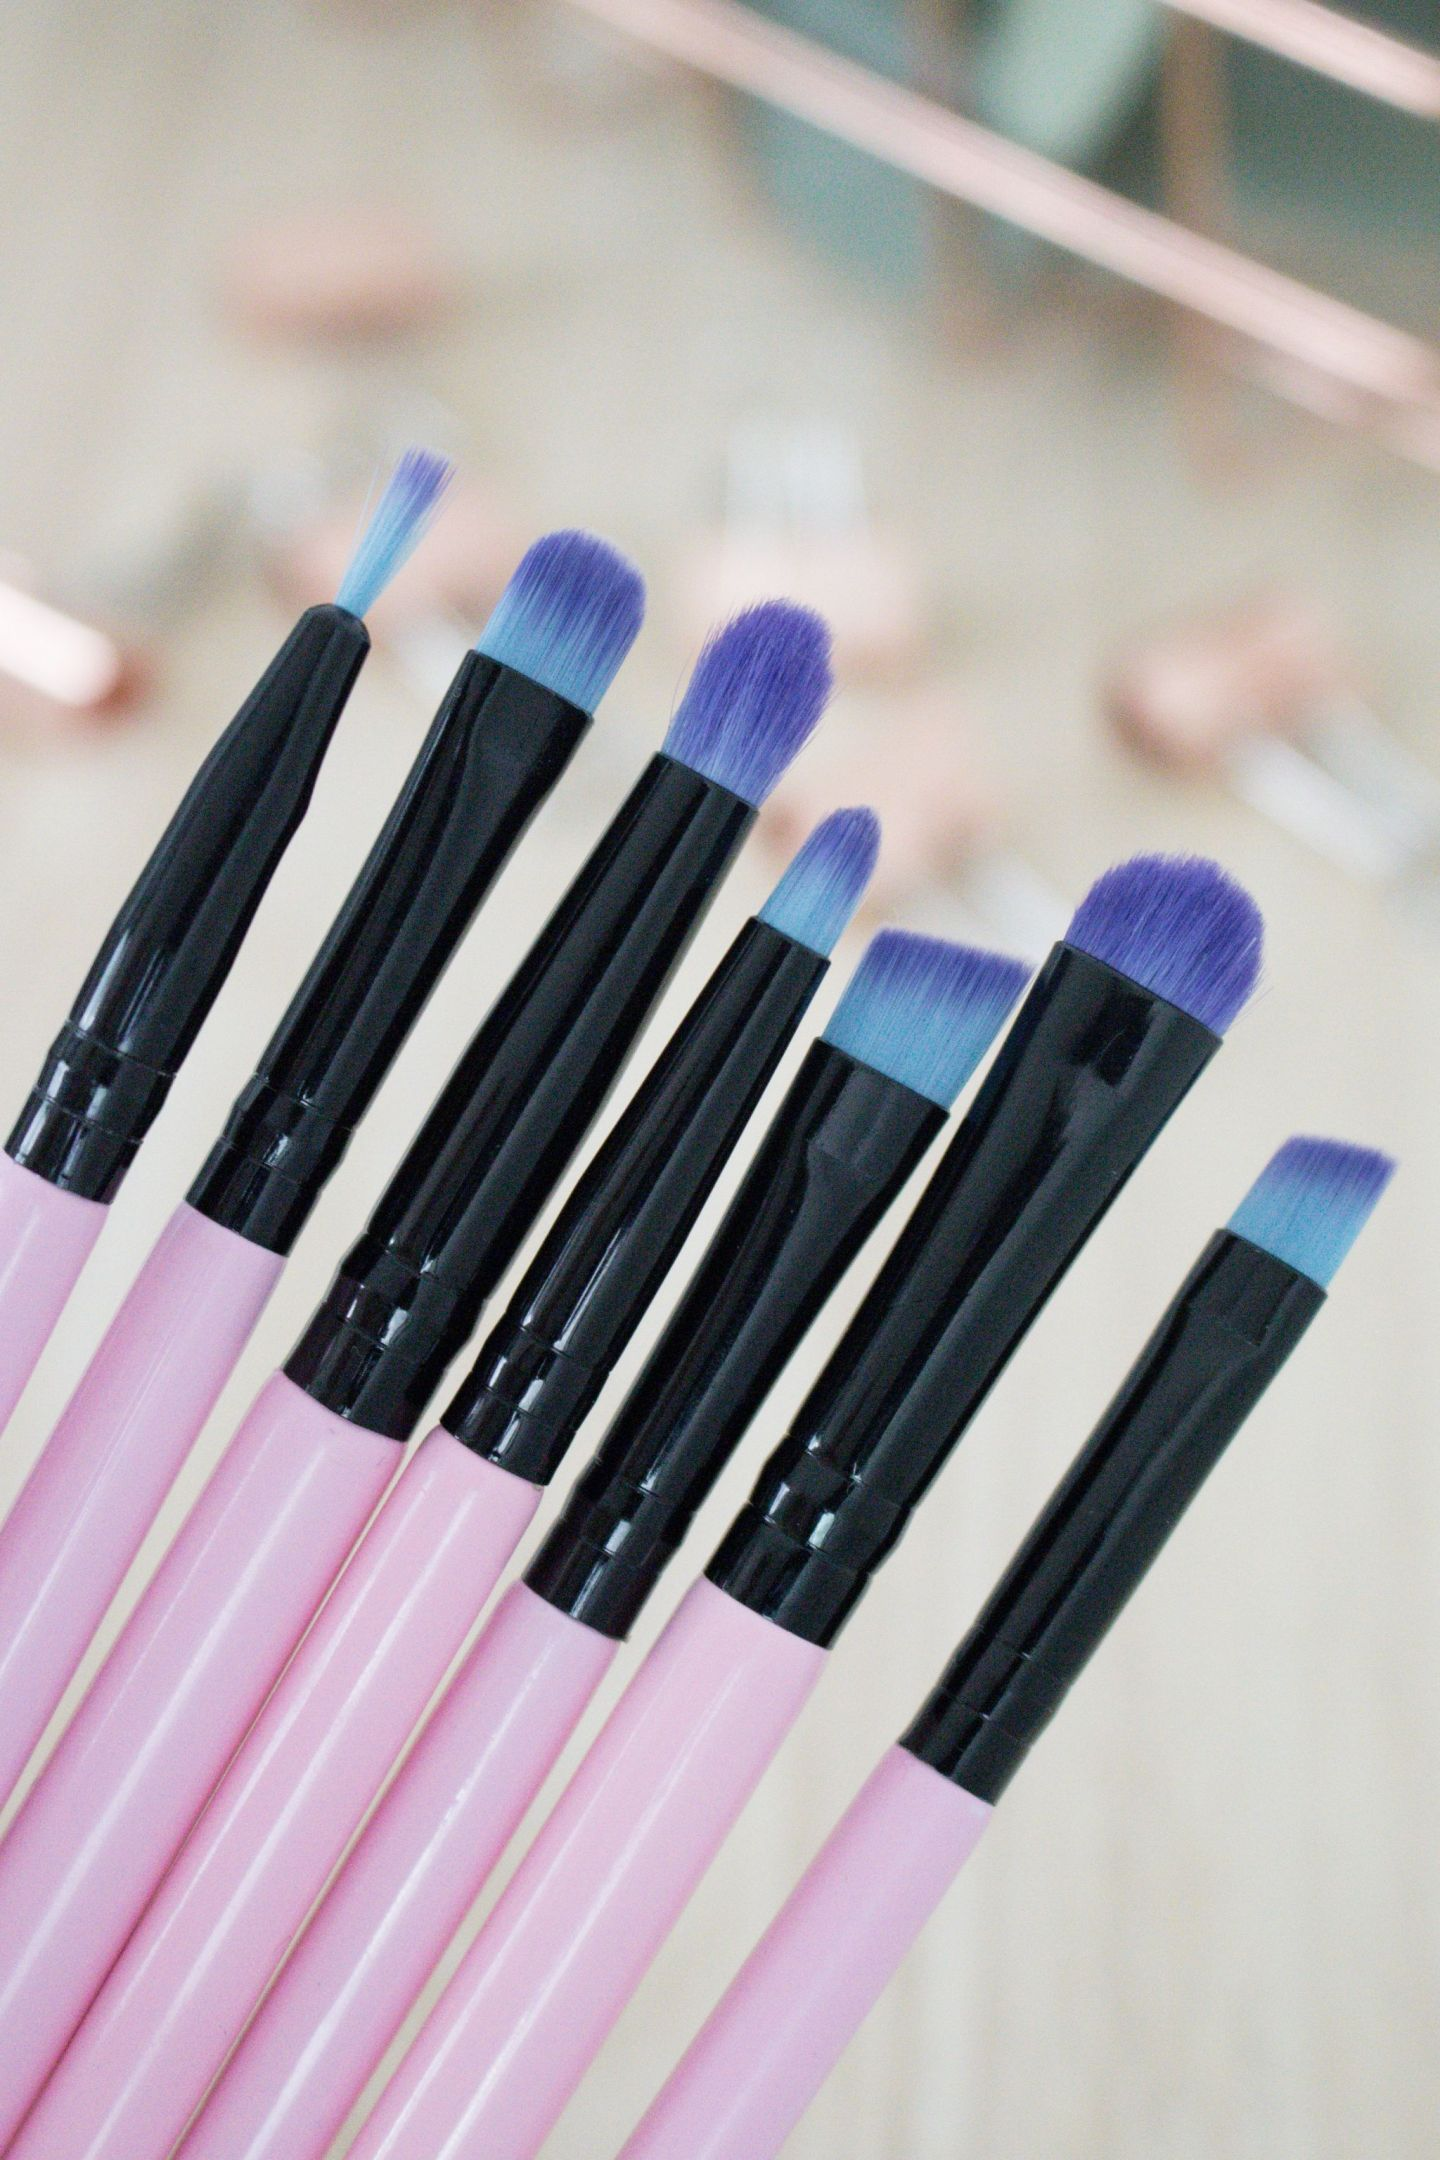 Spectrum Millennial Pink Eye Brushes